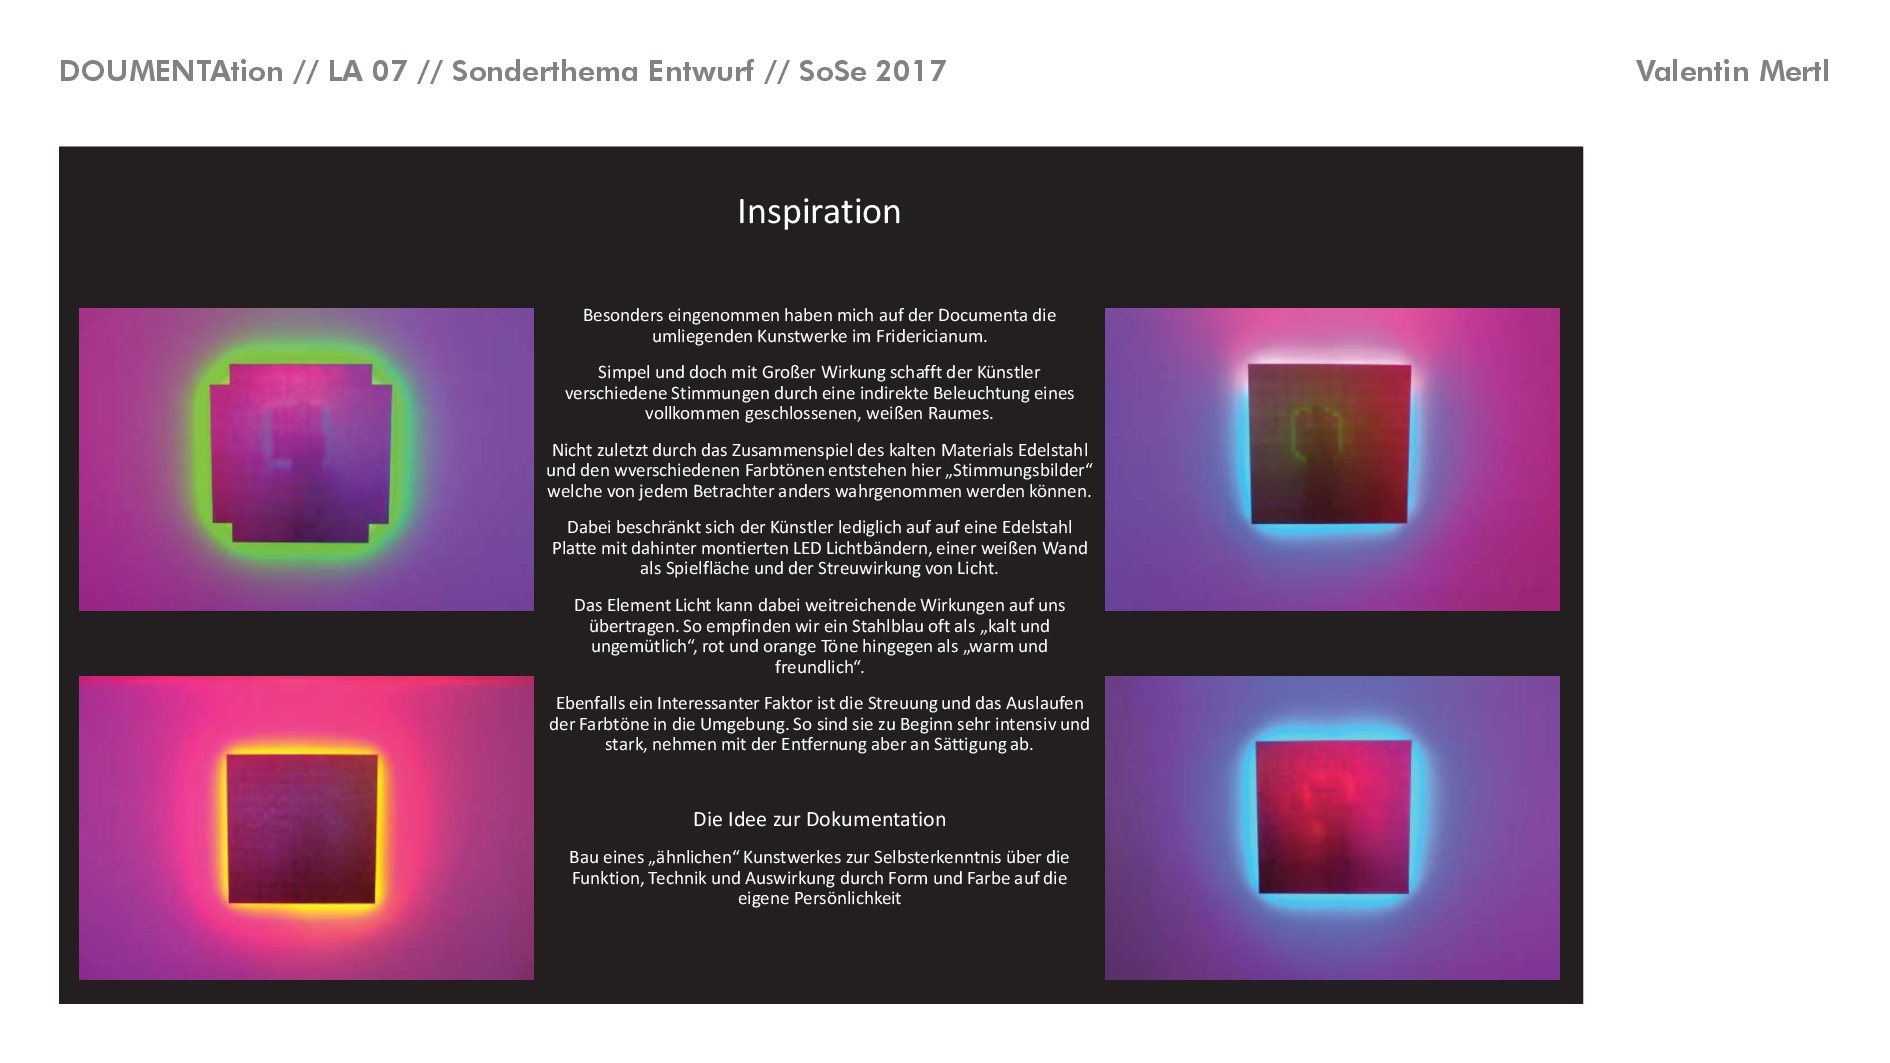 NEU Sonderthema Entwerfen SoSe 17 013